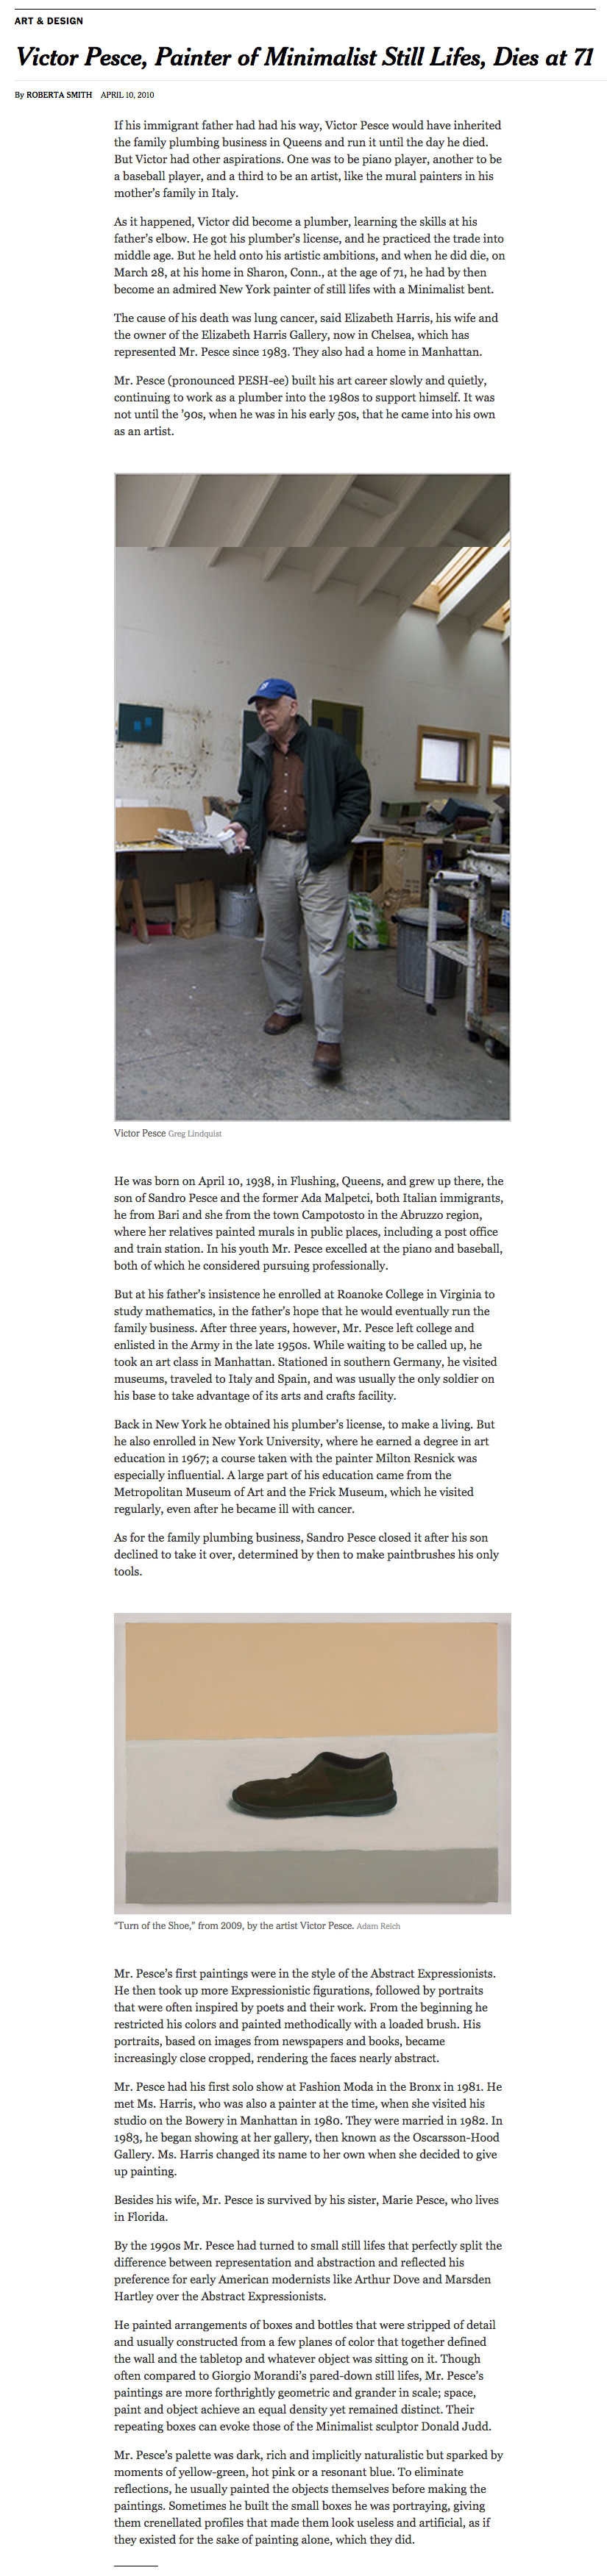 pesce_nytimes_obit.jpg